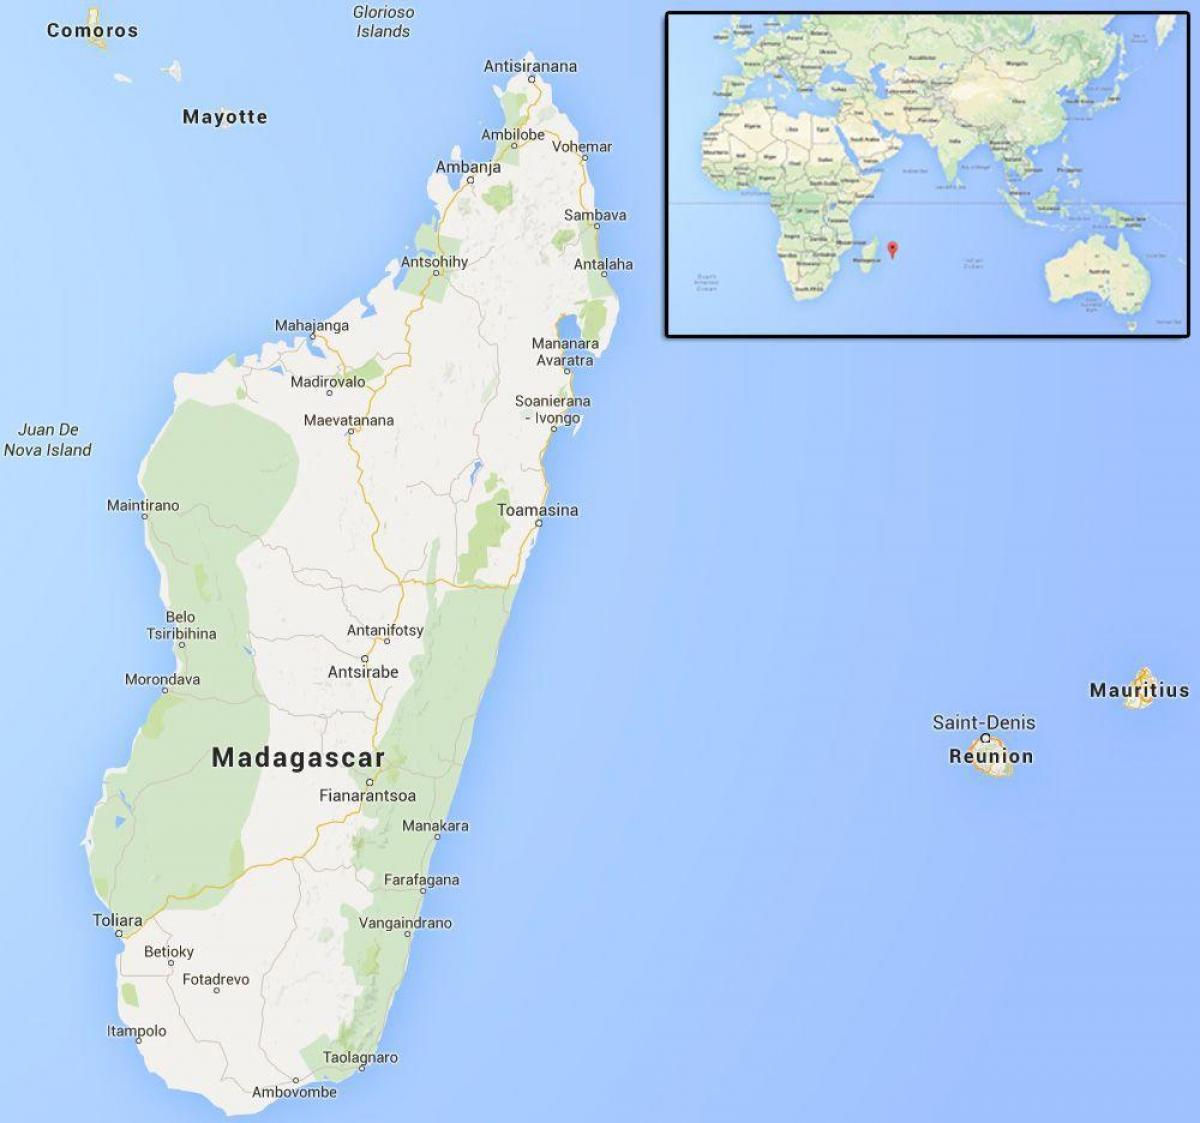 Isla De Madagascar Mapa.Islas Cerca De Madagascar Mapa Mapa De Islas Cerca De